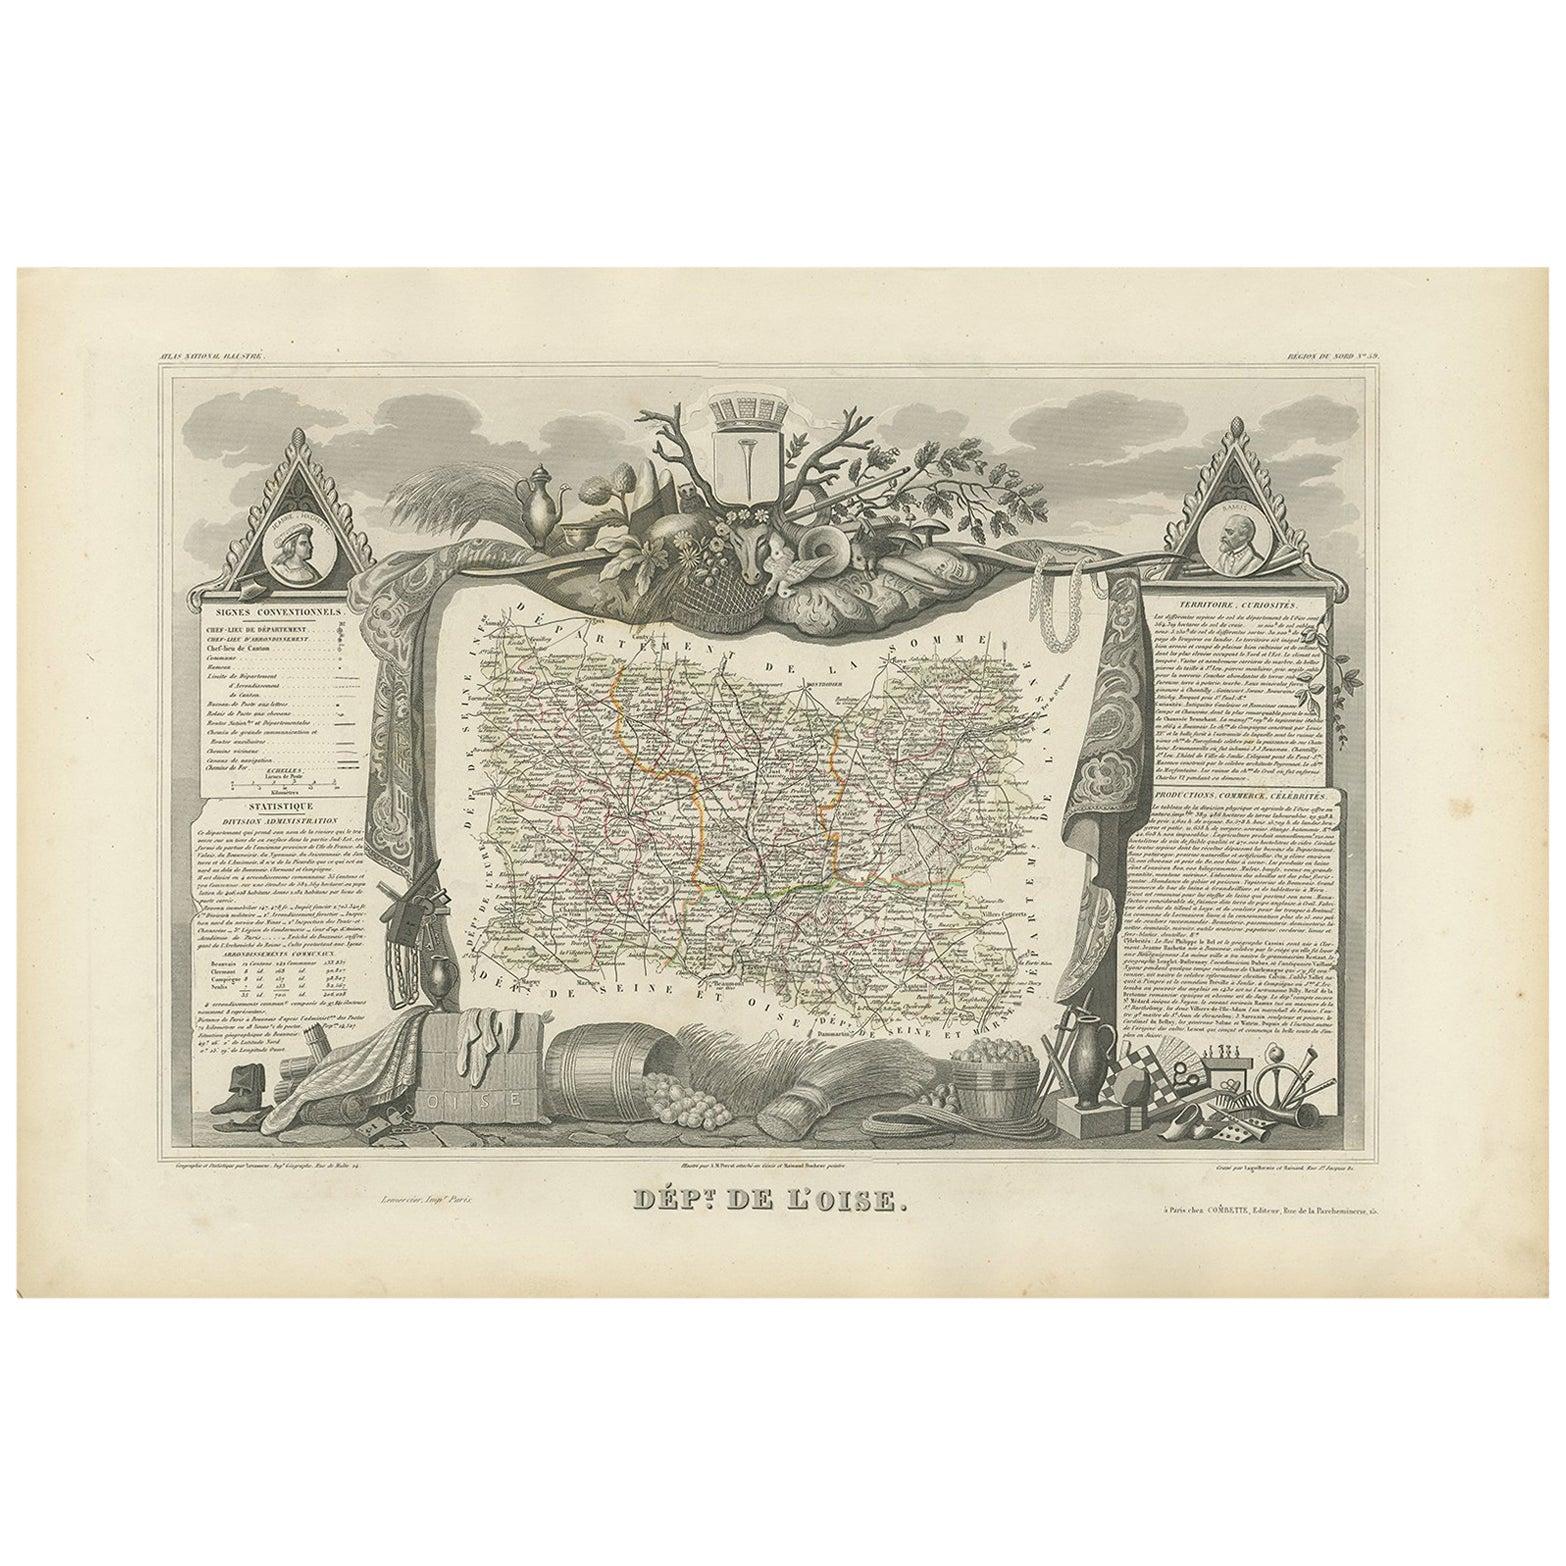 Antique Map of Oise 'France' by V. Levasseur, 1854